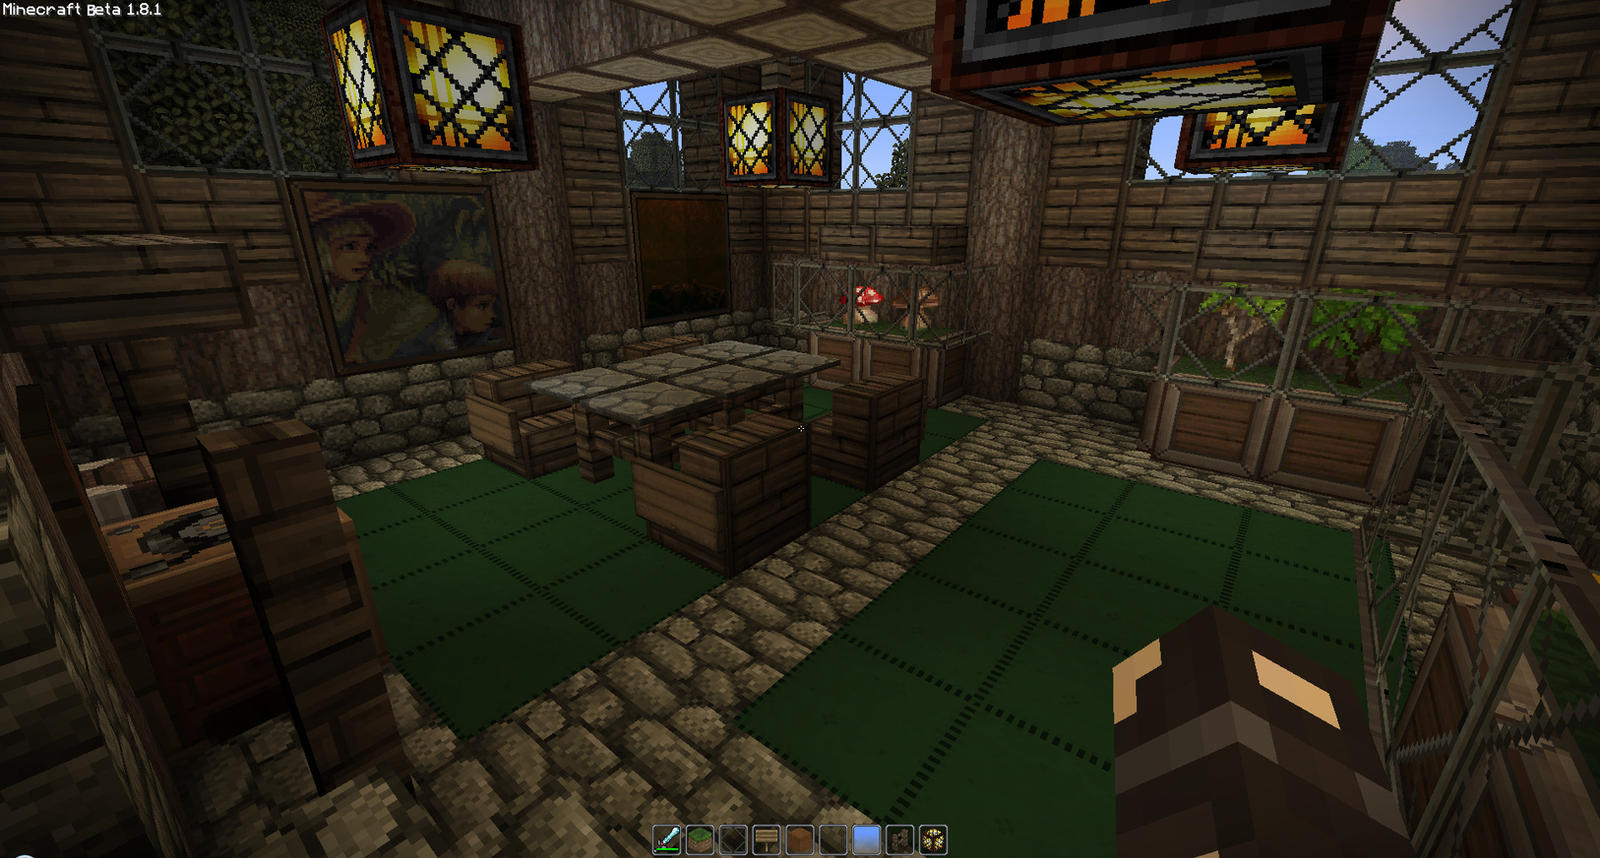 Farm house interior by oddworld90 on deviantart for Interior designs minecraft